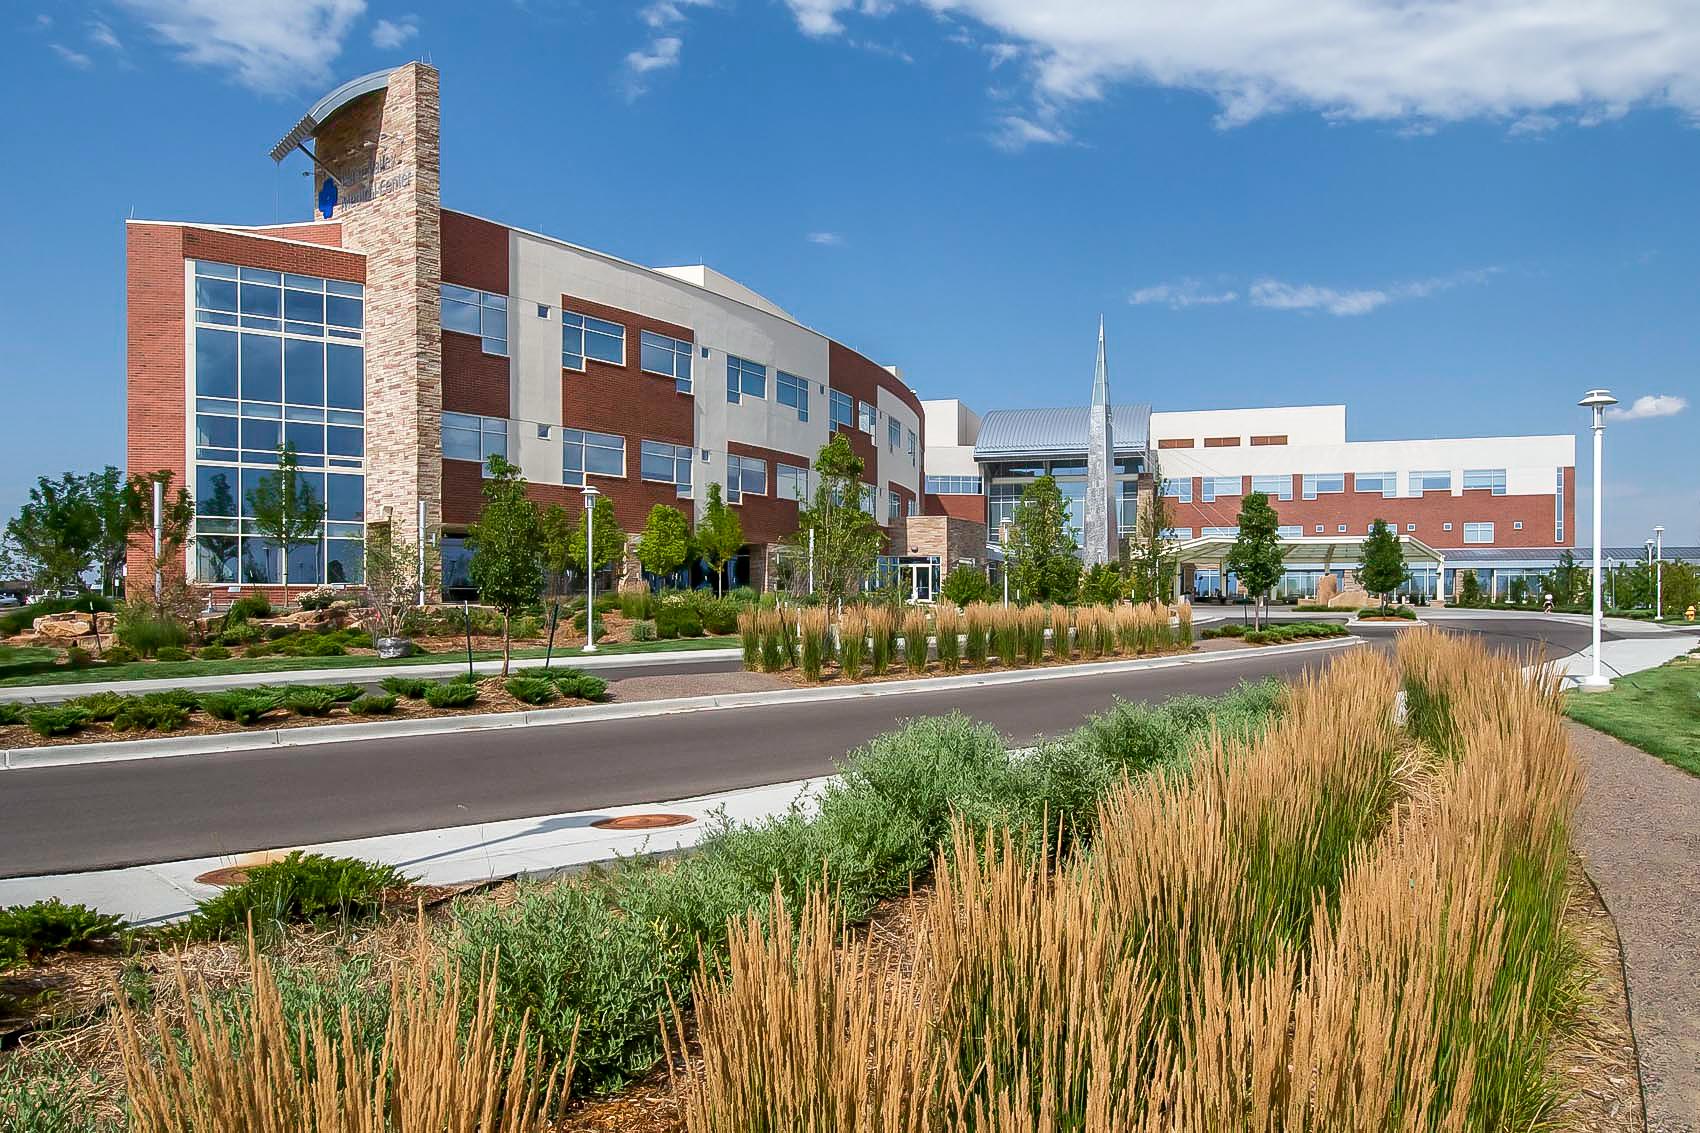 "<img src=""studioINSITE_Platte_Valley_Medical_Center_Entry_Drive""alt=""Healing Garden, Medical Campus, Master Plan, Landscape Architecture, Brighton Colorado, Therapeutic Gardens"" title=""Platte Valley Medical Center""/>"